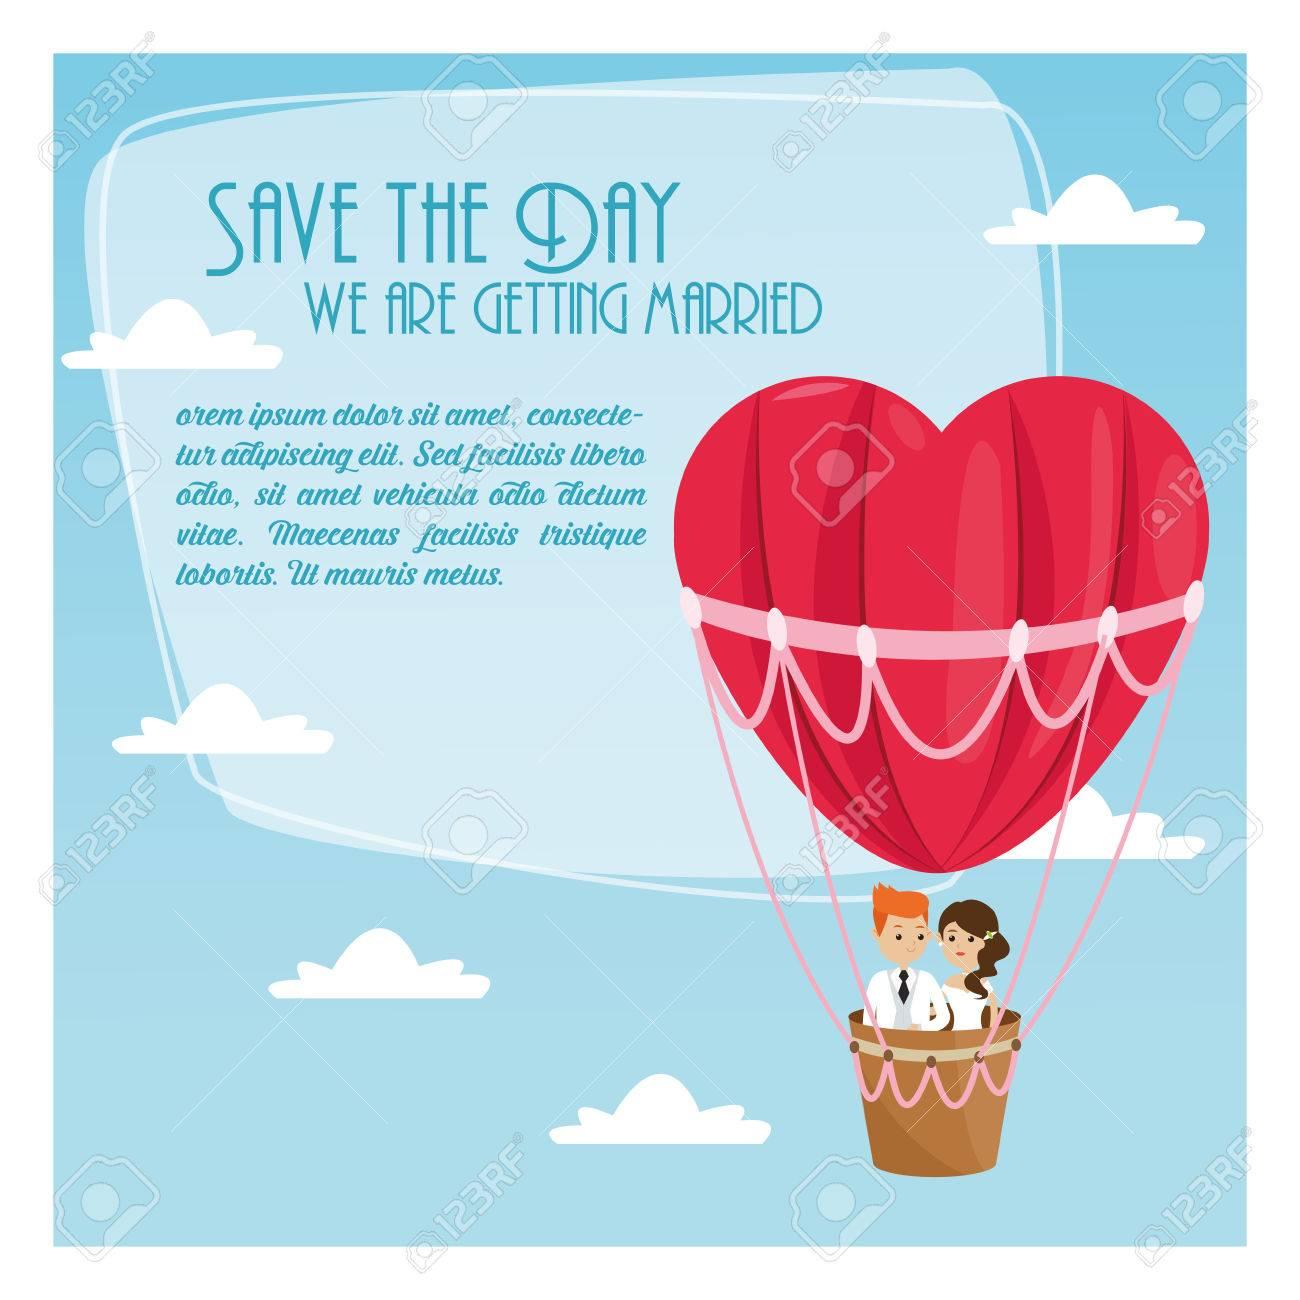 Hot Air Balloon Wedding Invitations Choice Image - Party ...